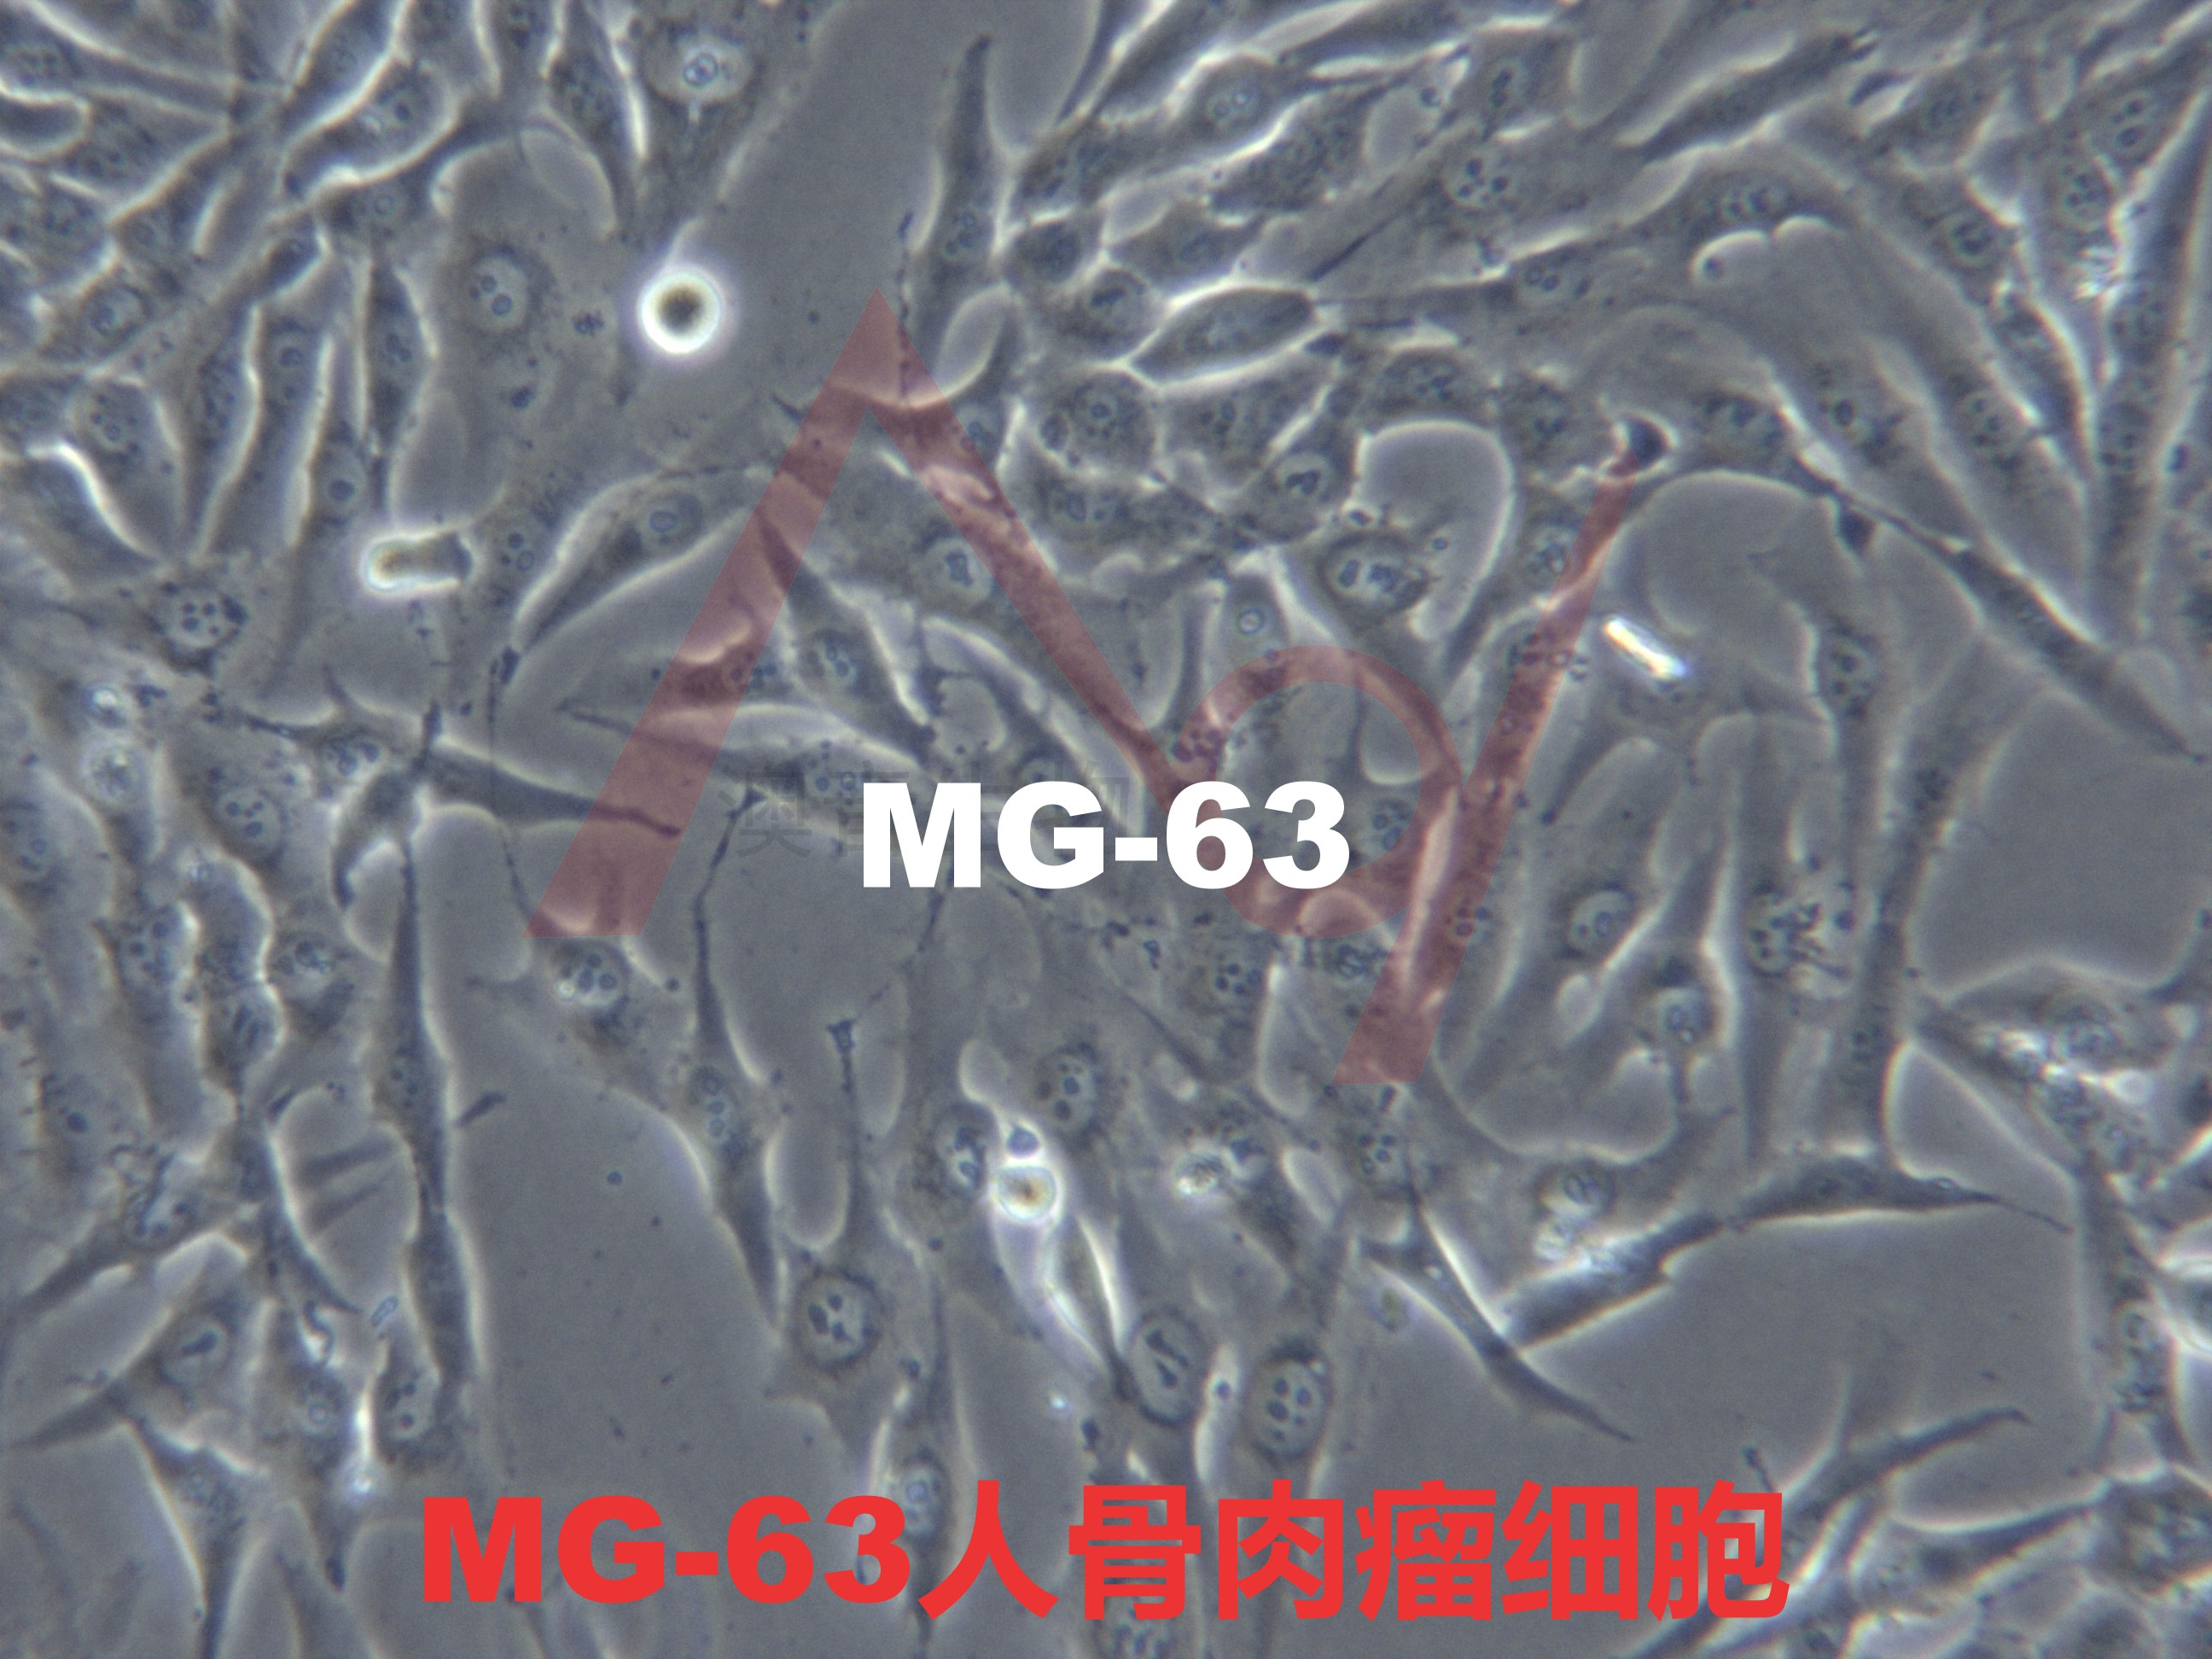 MG-63[M-G63; MG63]人骨肉瘤细胞